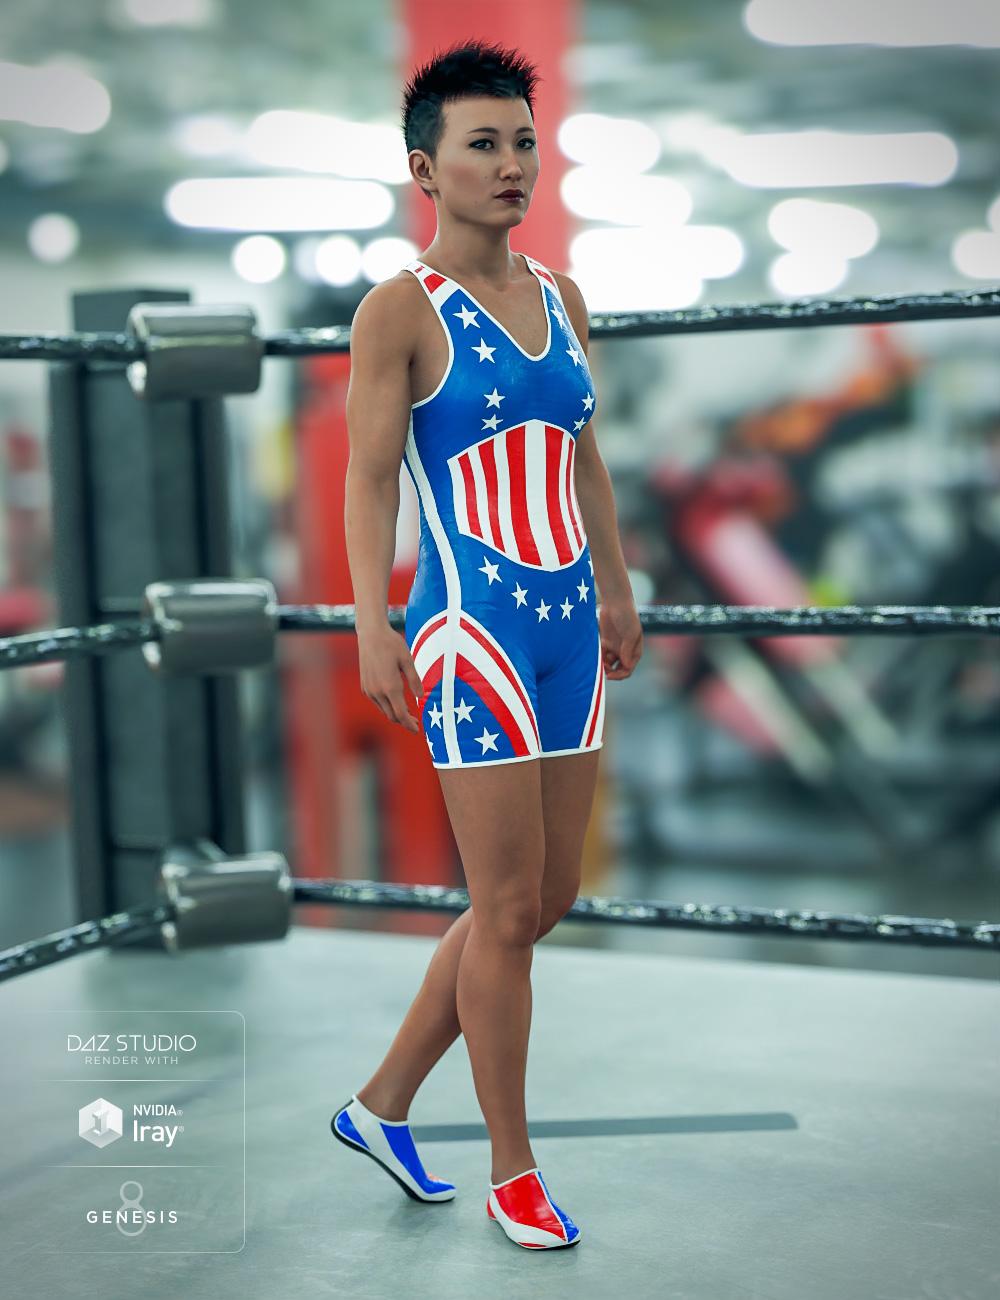 Amateur Wrestler Outfit Textures by: Sixus1 Media, 3D Models by Daz 3D